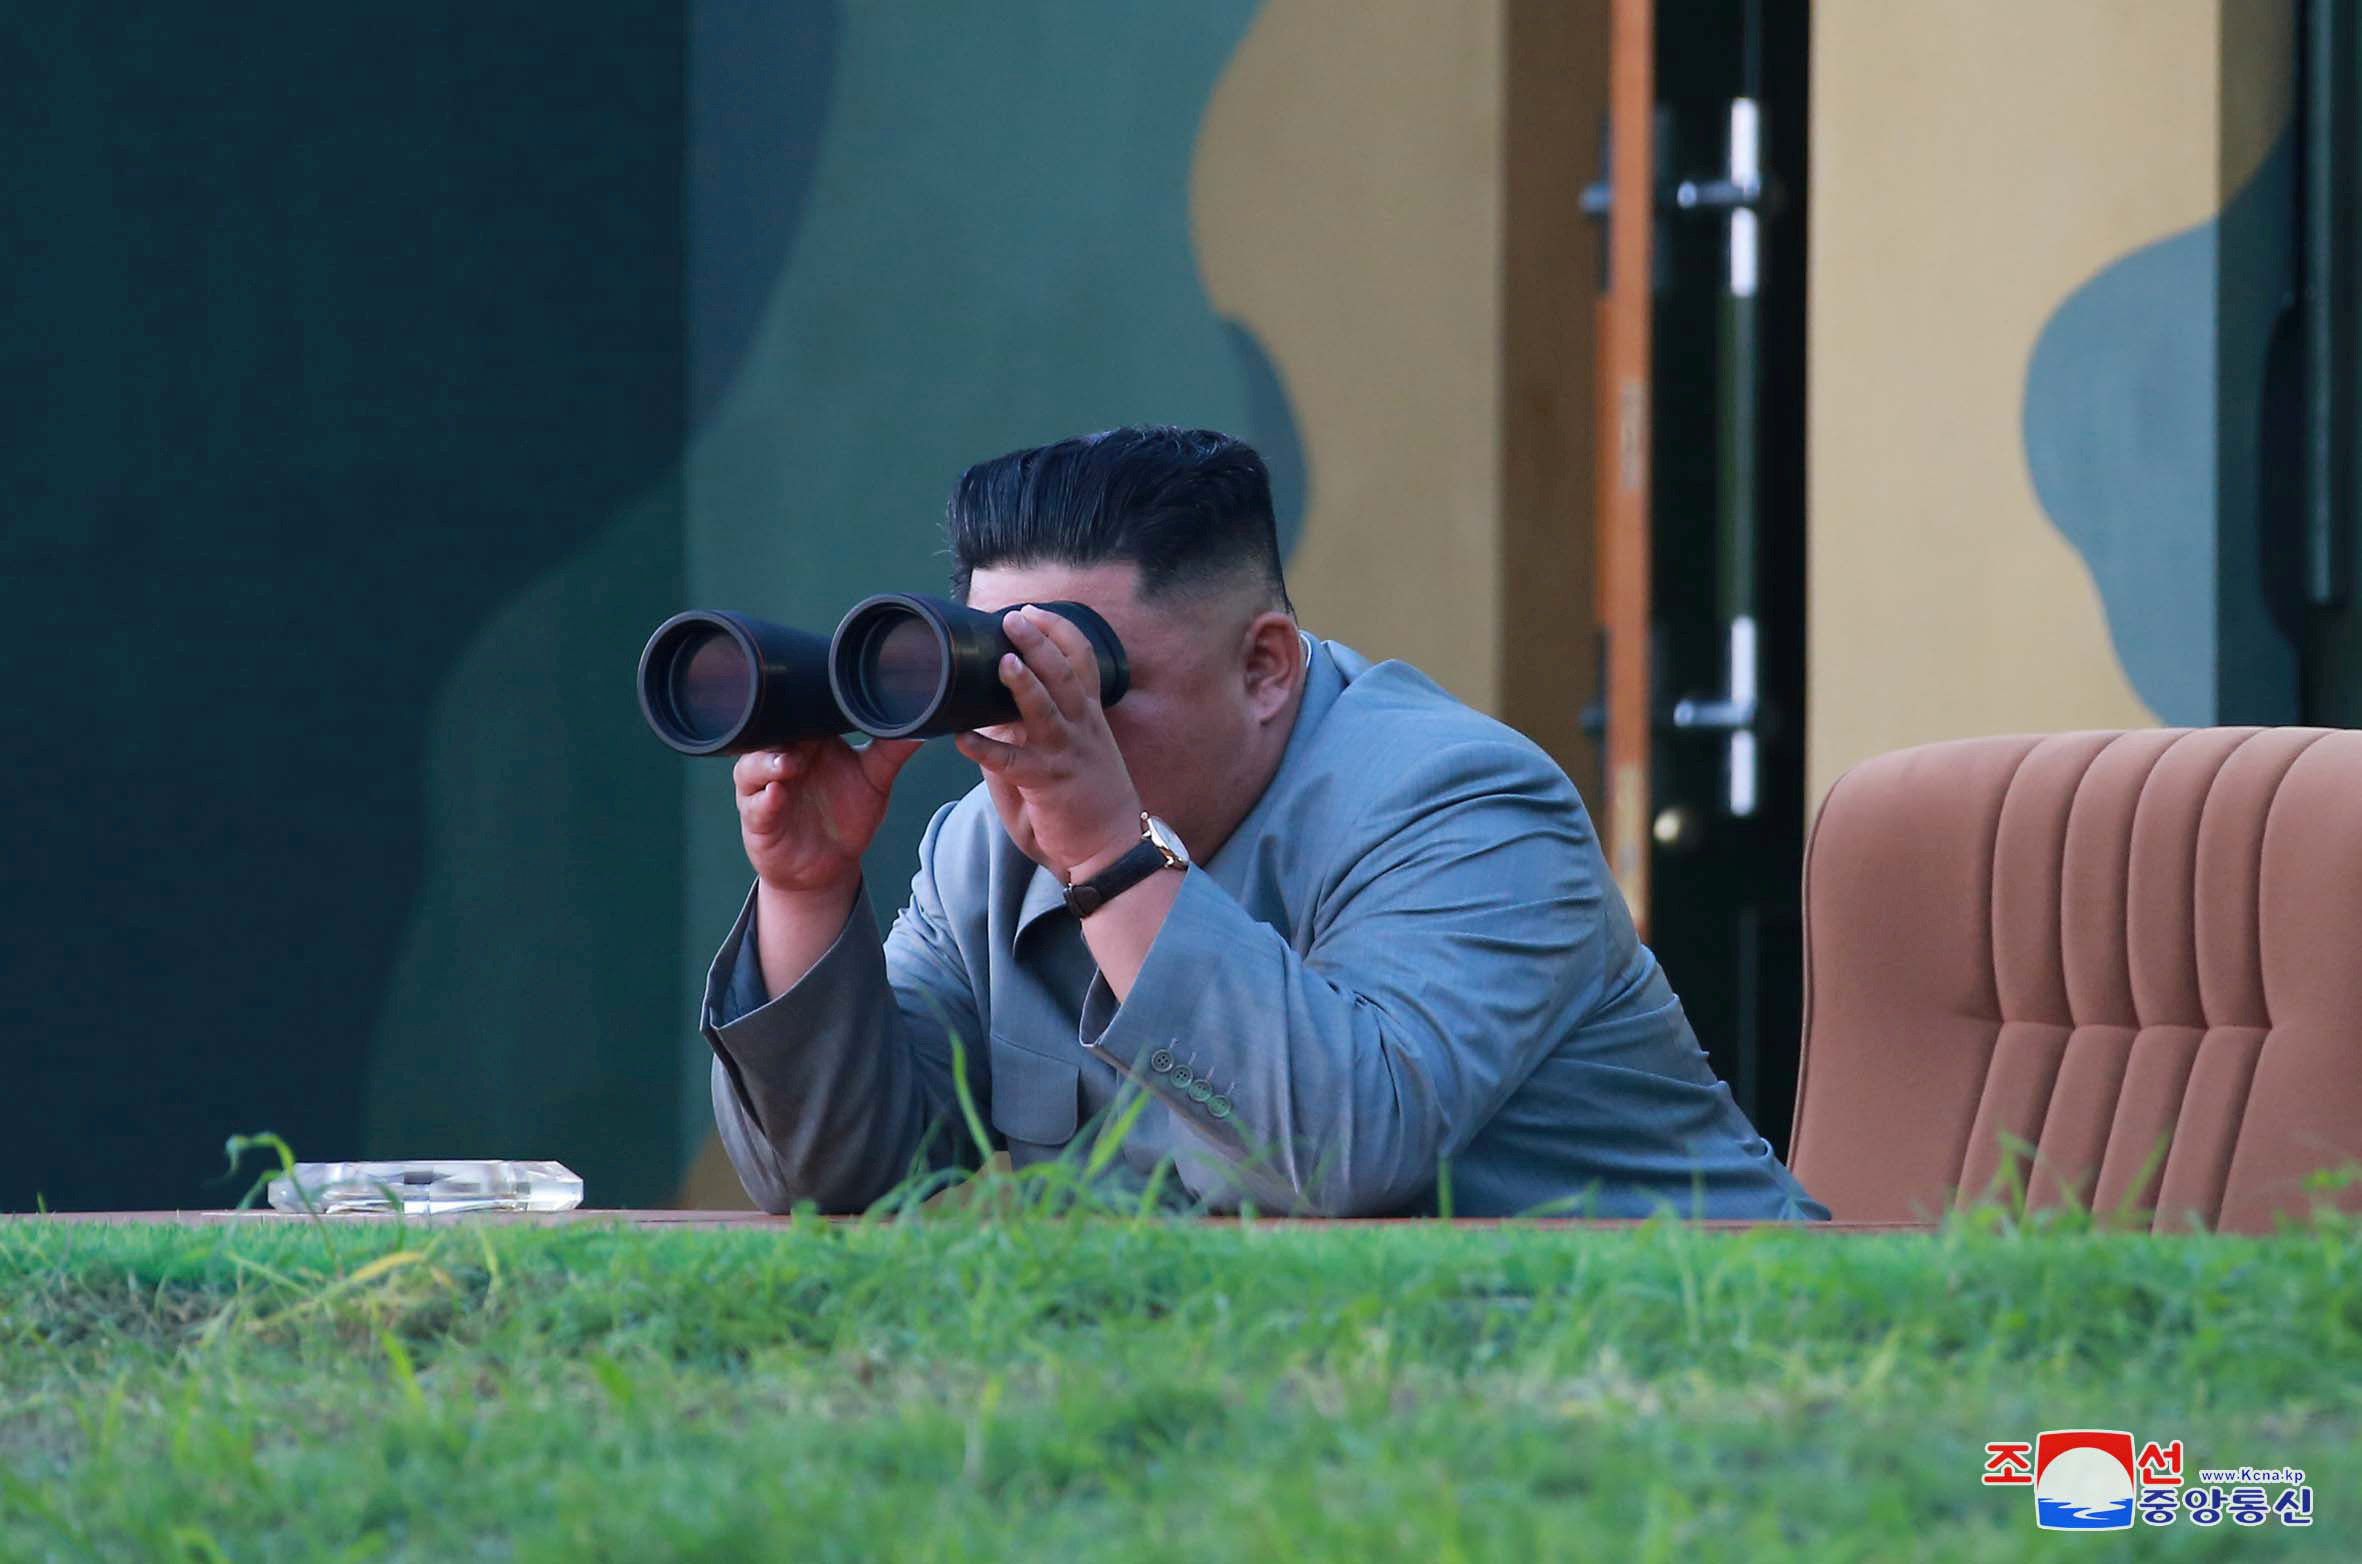 Kim Jong-un looks through binoculars and leans over a ledge